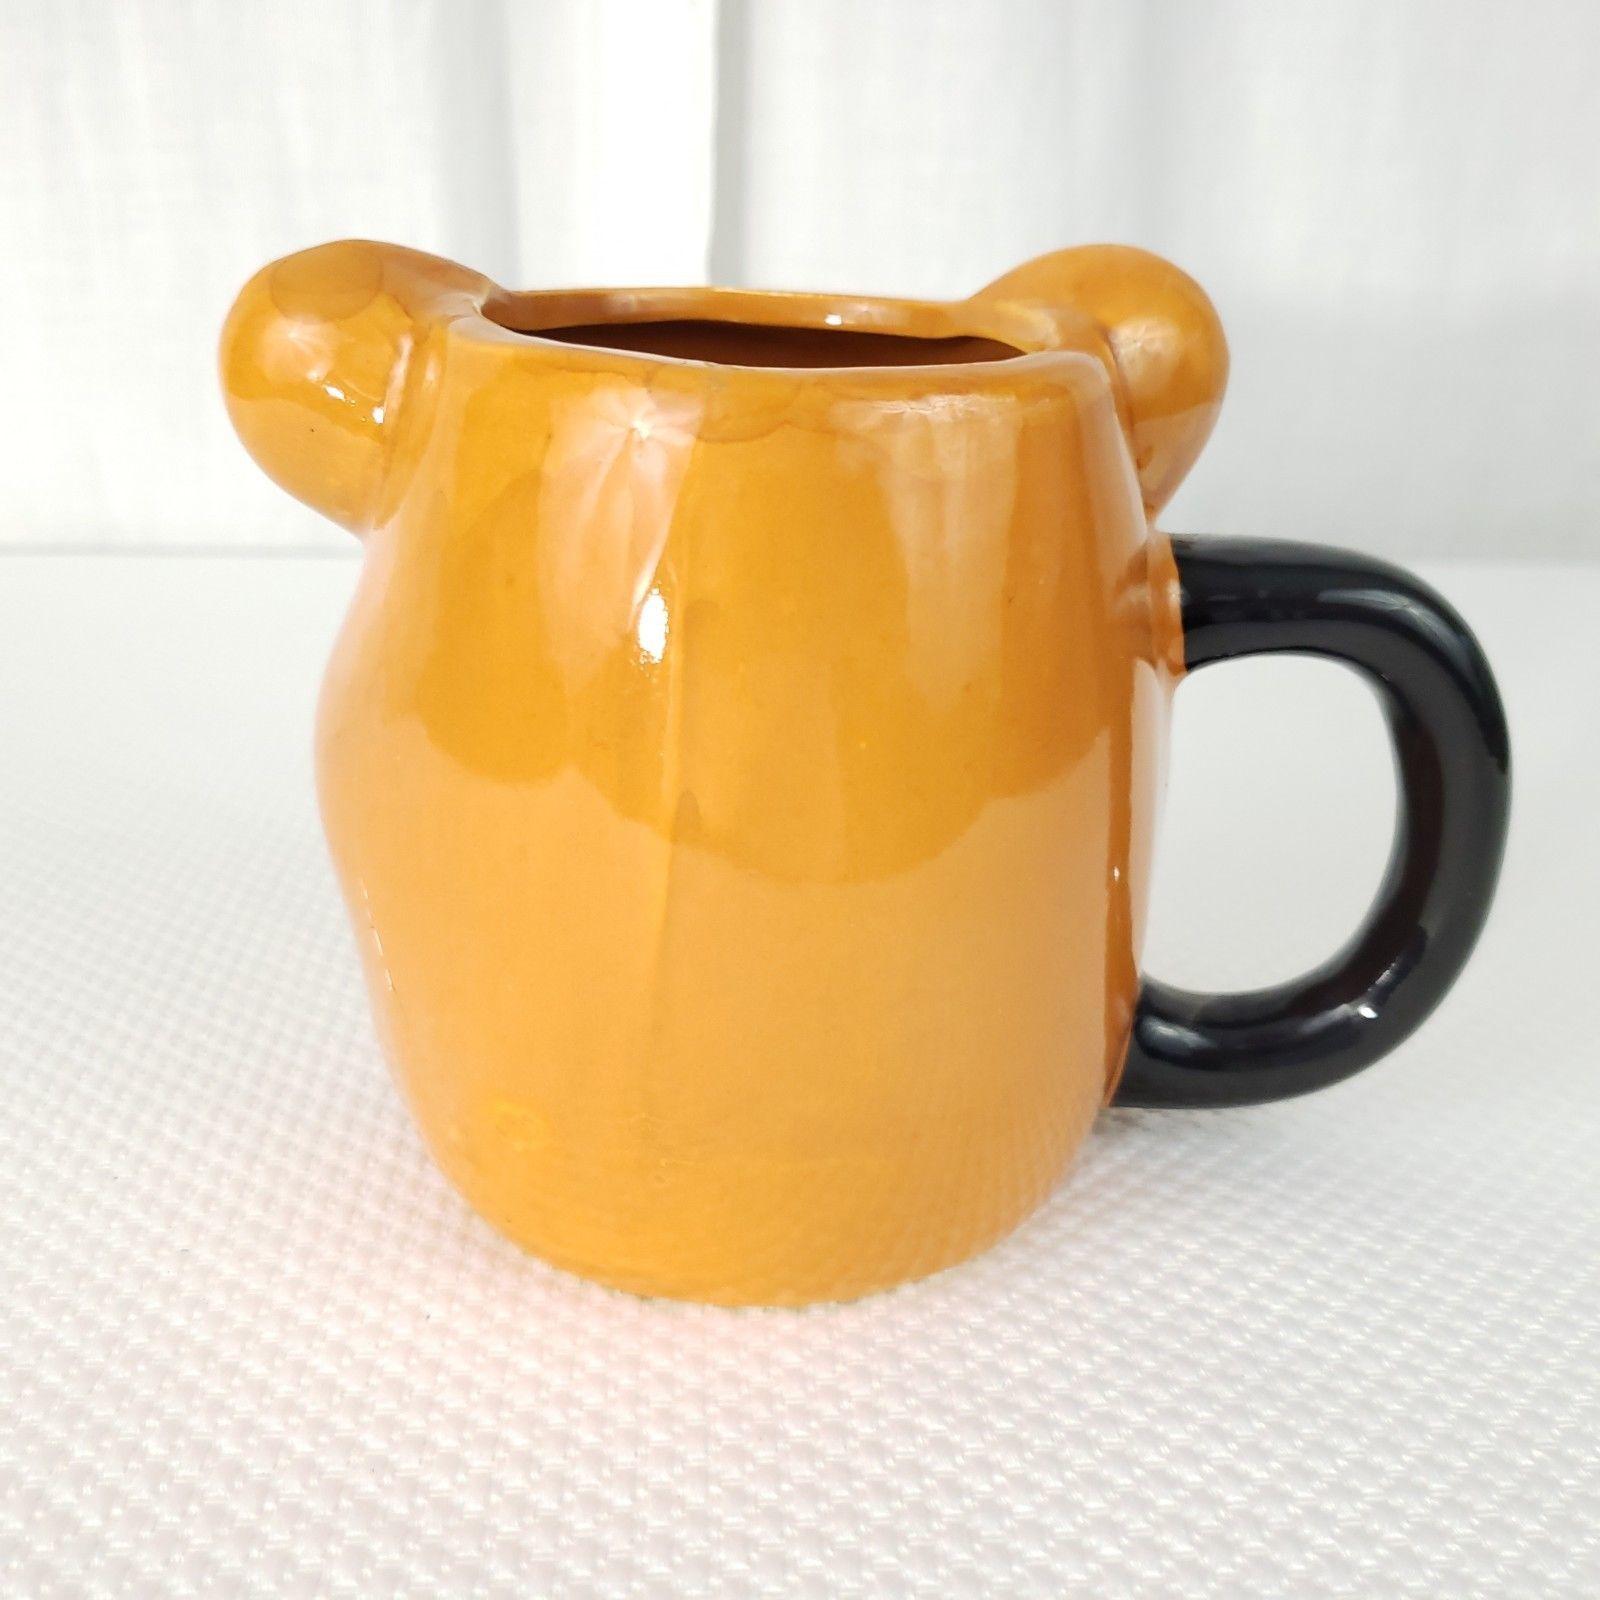 Five Nights At Freddy's Fazbear Molded Ceramic Mug With Damage